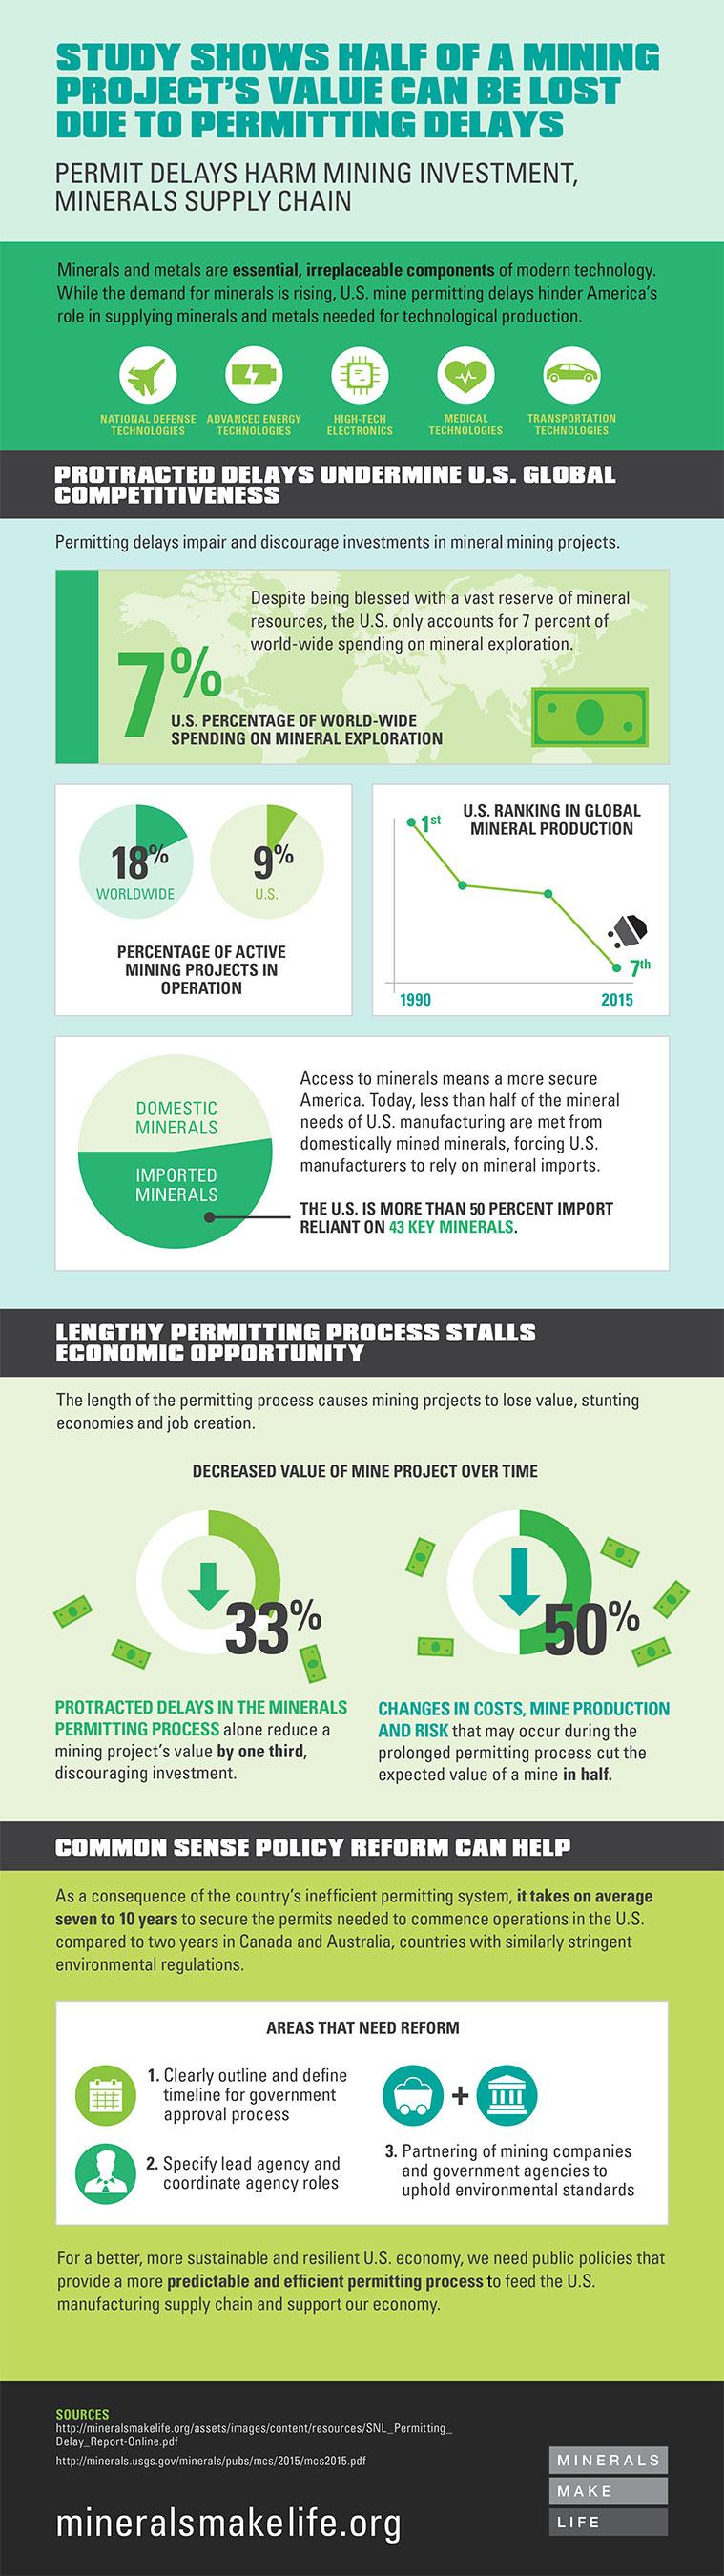 SNL Infographic